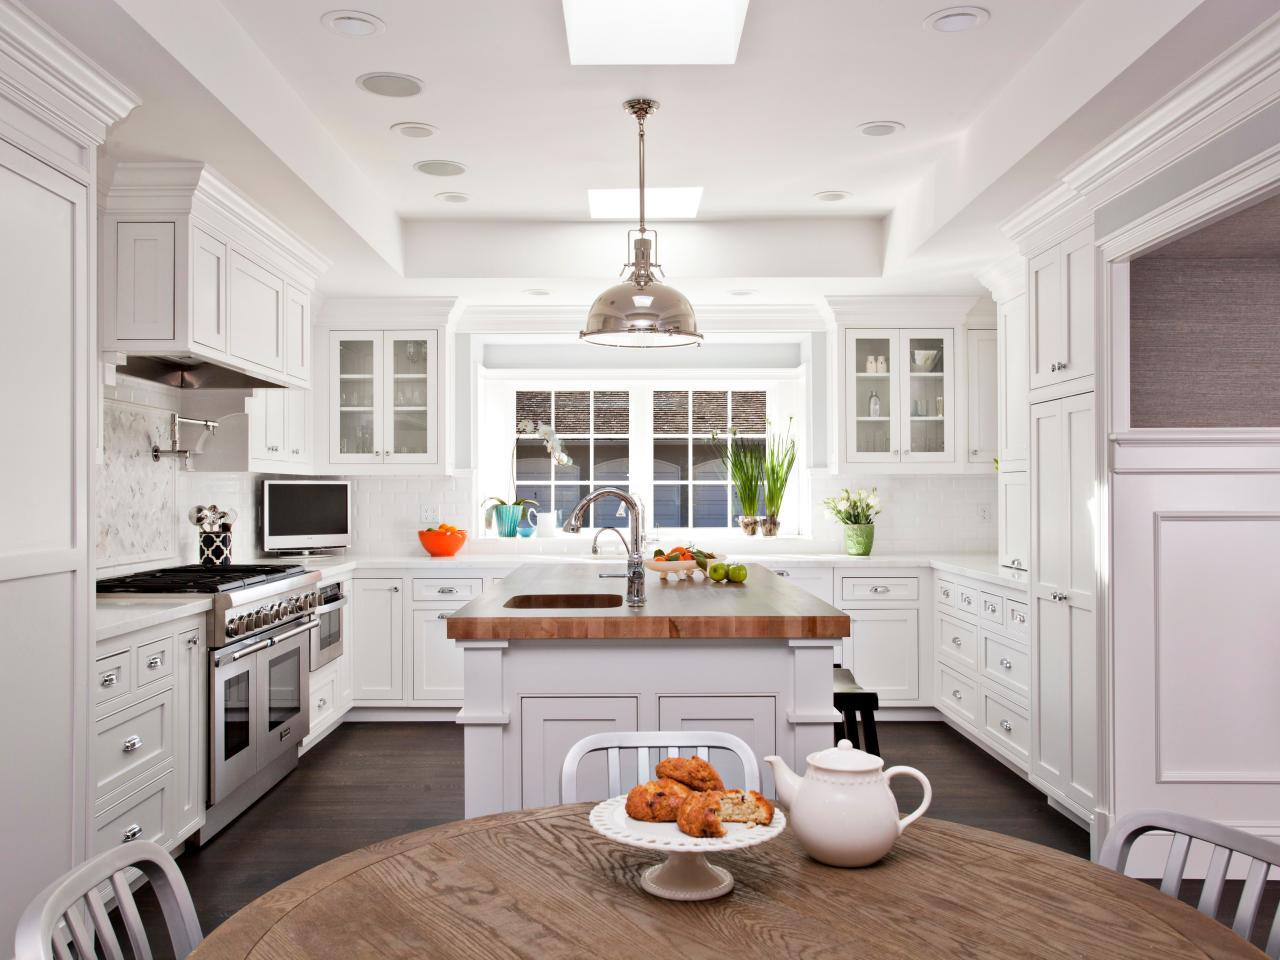 Transitional White Kitchen With Butcher Block Island | HGTV